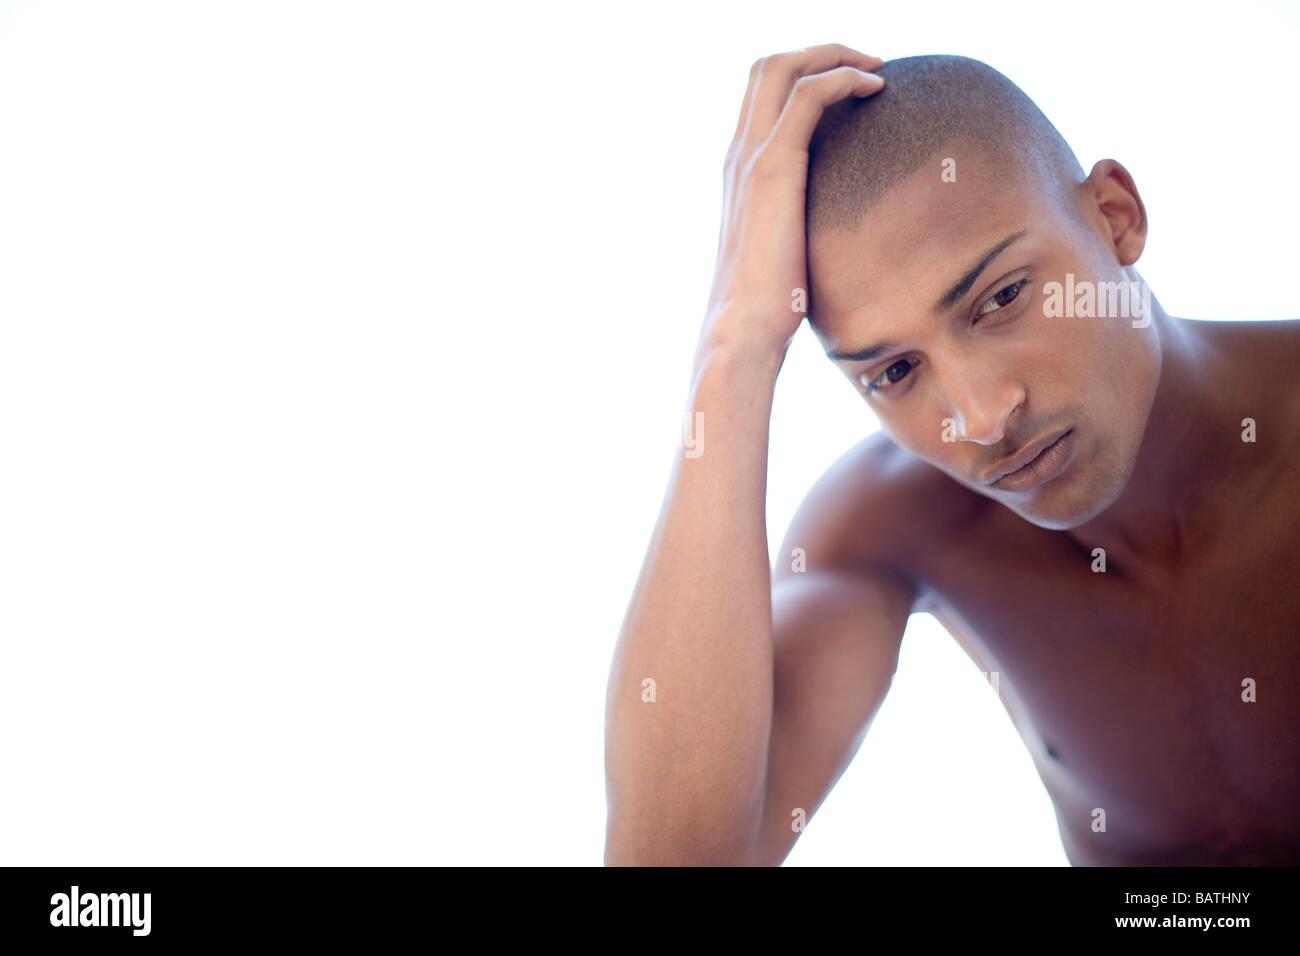 Depressed young man. He is twenty years old. - Stock Image